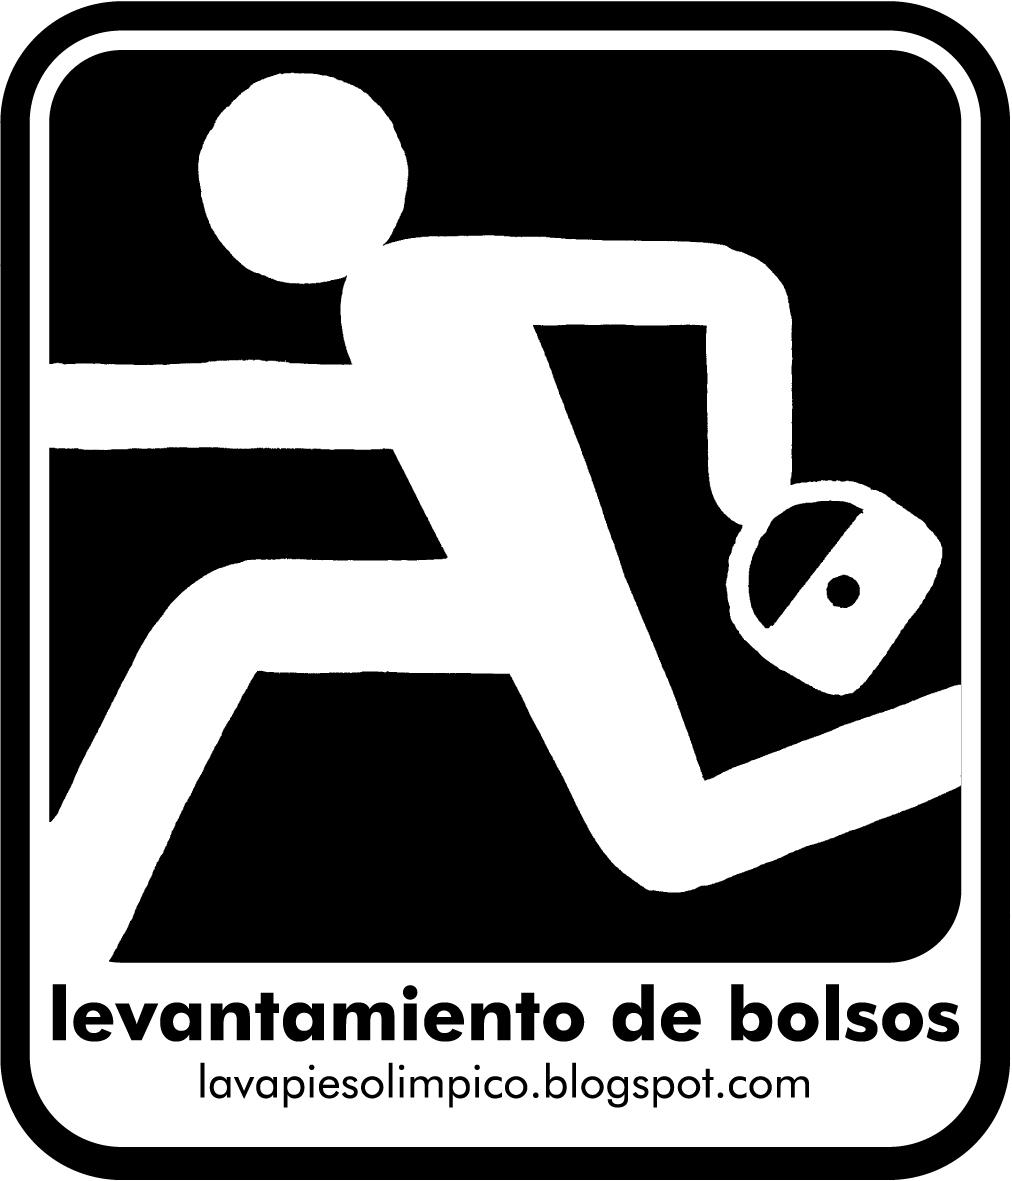 [lavapiesolimpico.blogspot.com_01.jpg]